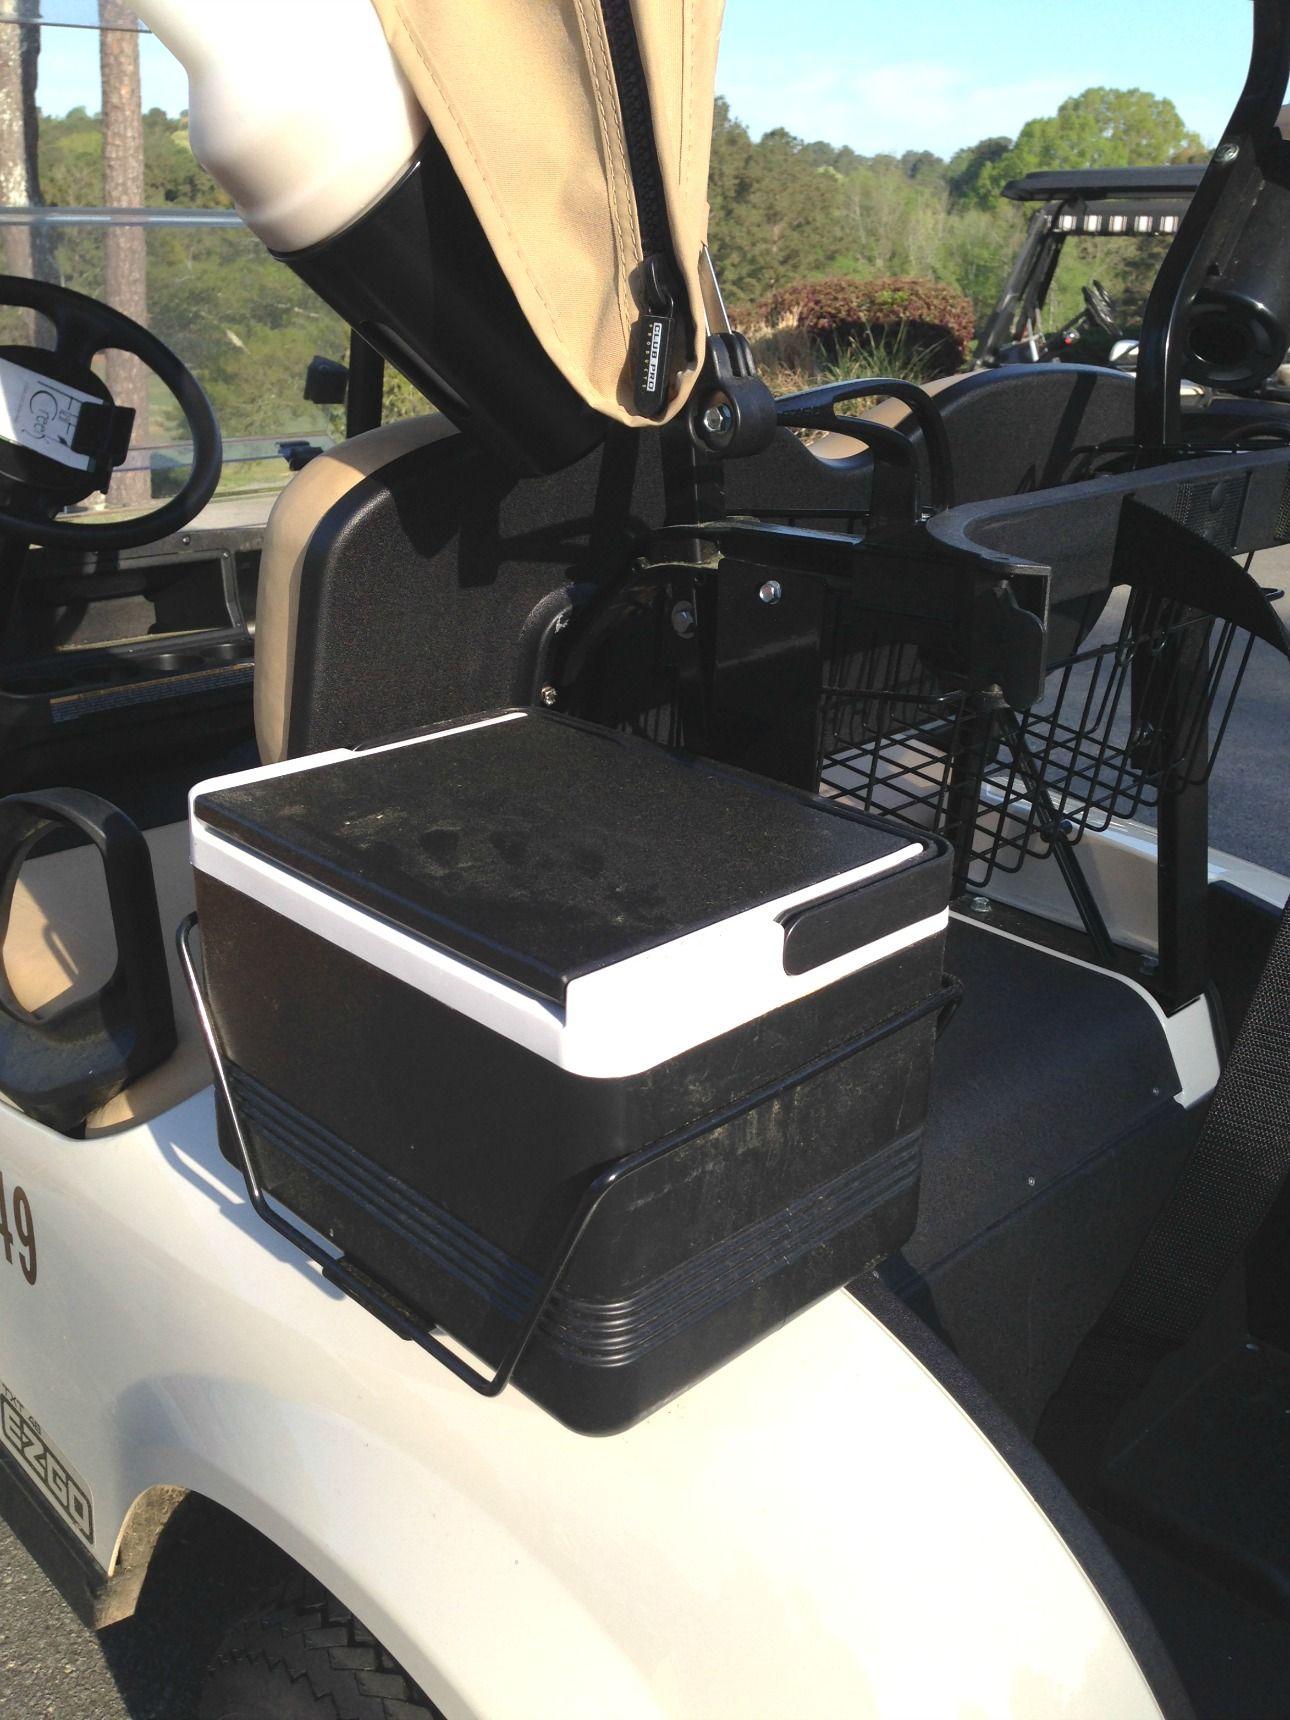 2005 Ezgo Txt Wiring Diagram 2004 Chevy Silverado Parts Golf Cart Accessories For Style Comfort